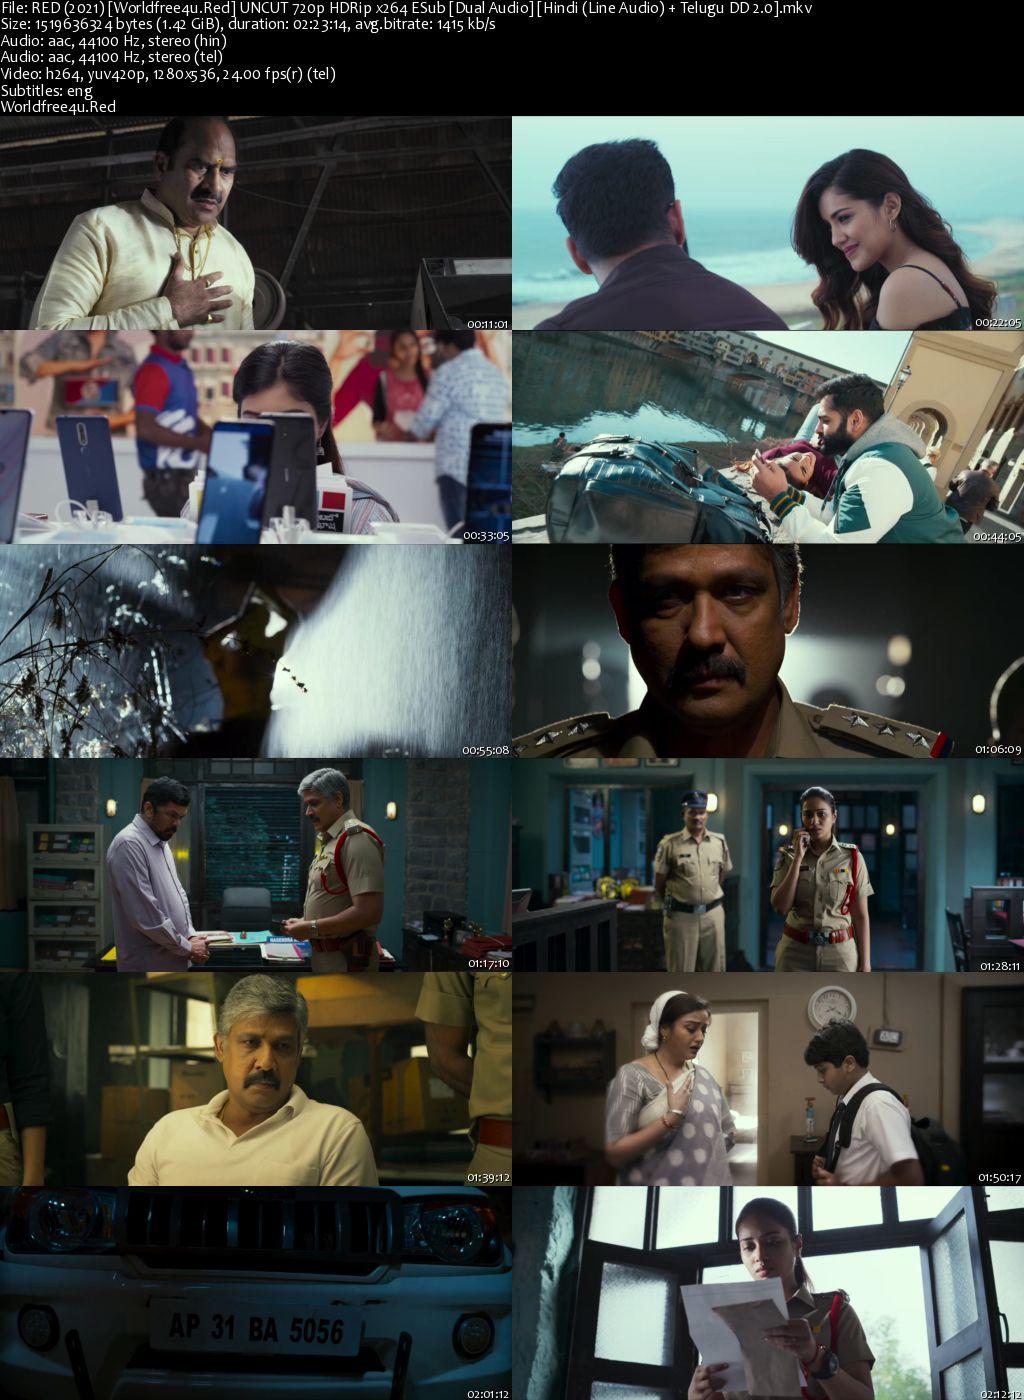 Red 2021 Hindi Dubbed HDRip 720p ESub